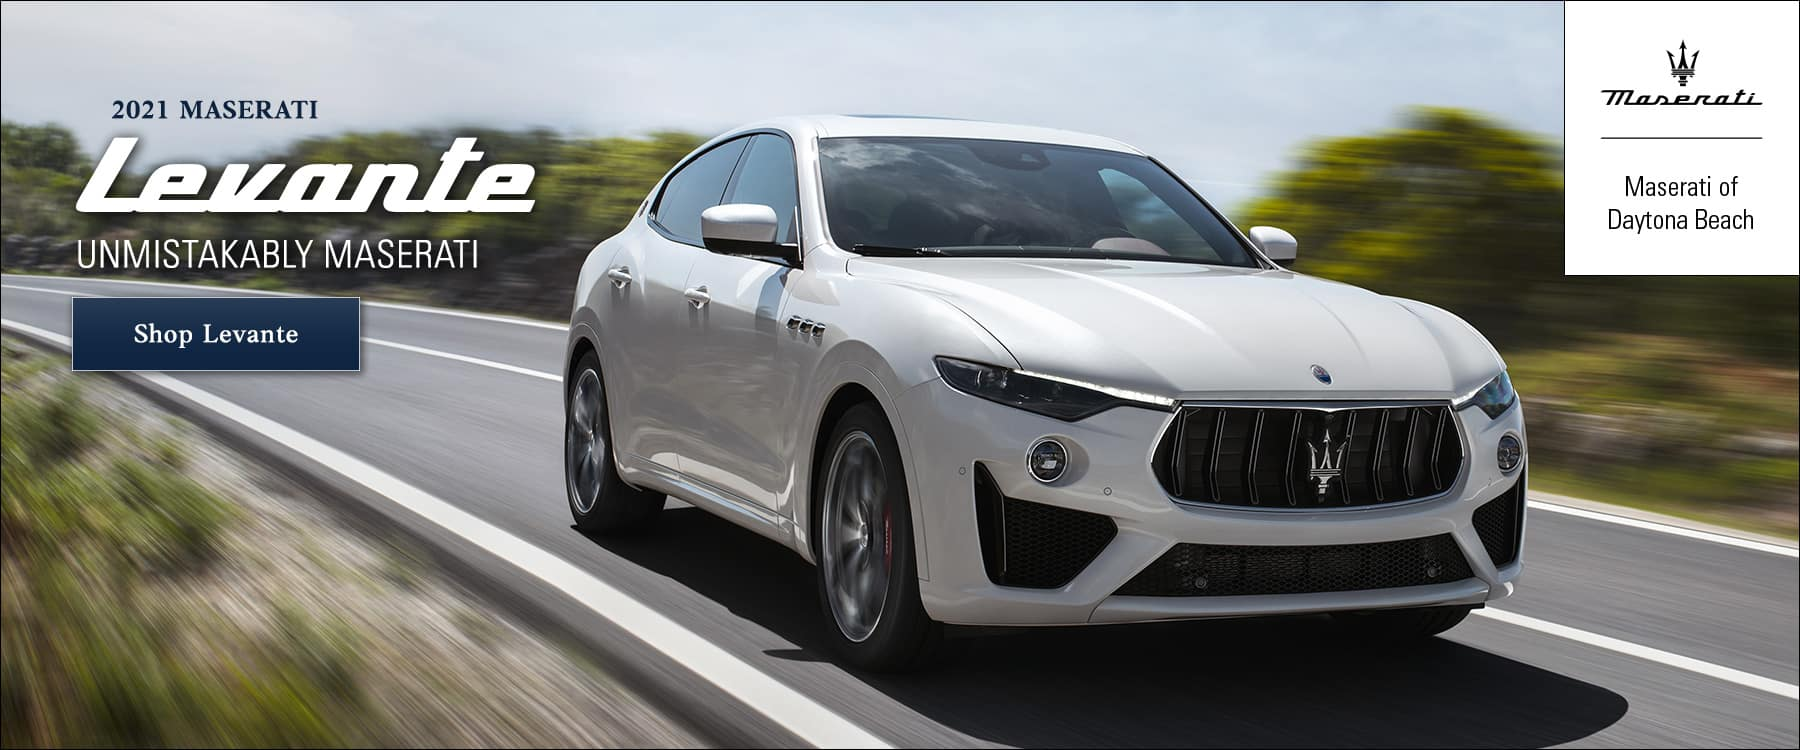 DMAR-2021-Maserati-1800×750-MY21-Levante-Evergreen